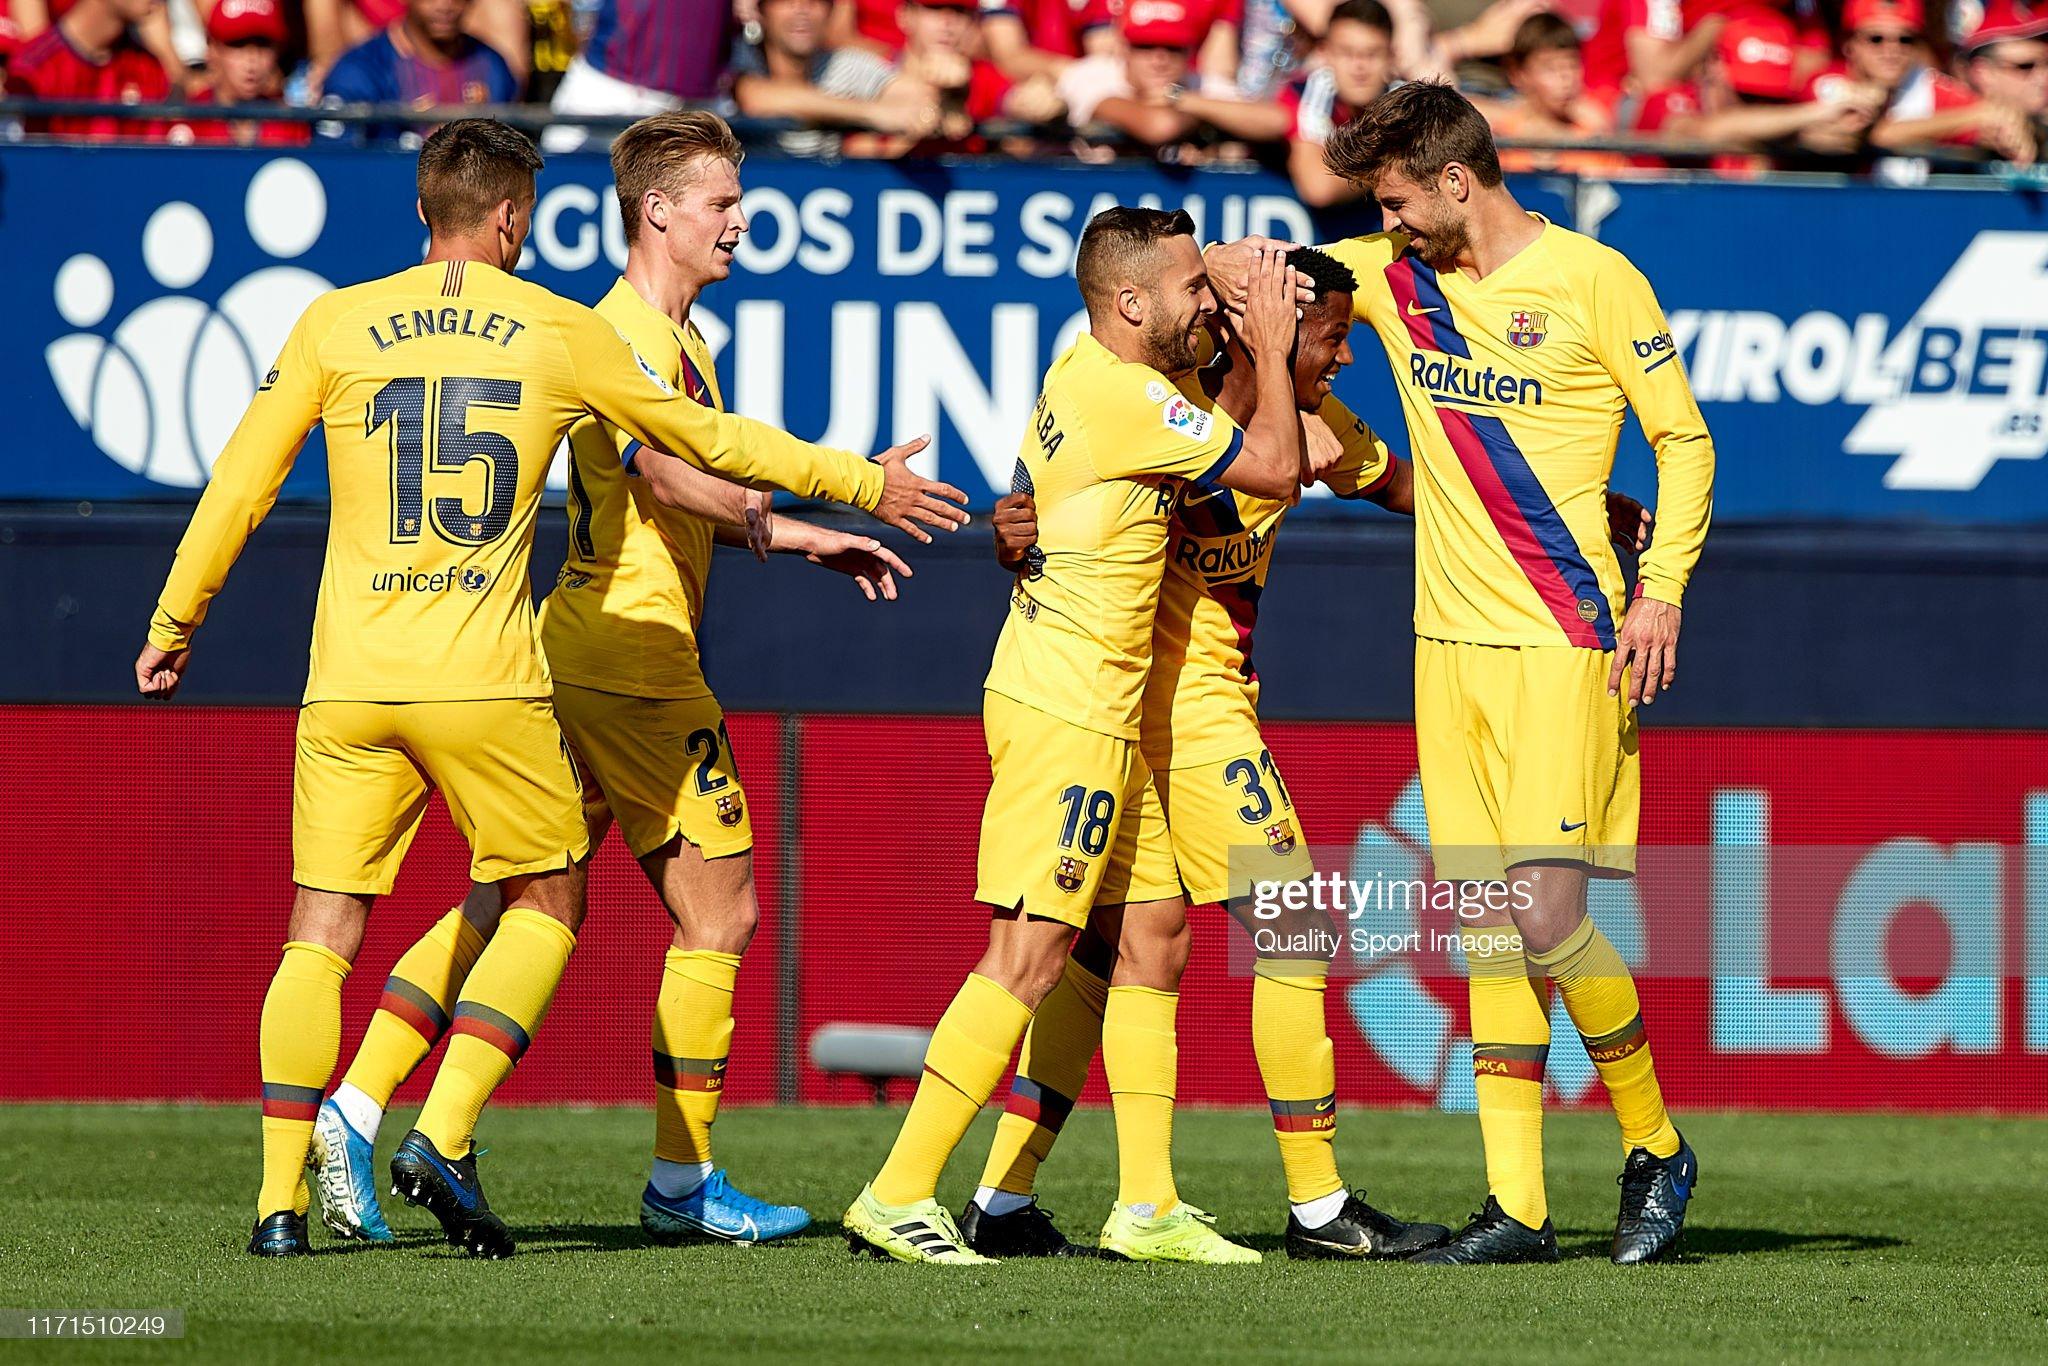 صور مباراة : أوساسونا - برشلونة 2-2 ( 31-08-2019 )  Players-of-fc-barcelona-celebrating-their-teams-first-goal-during-the-picture-id1171510249?s=2048x2048